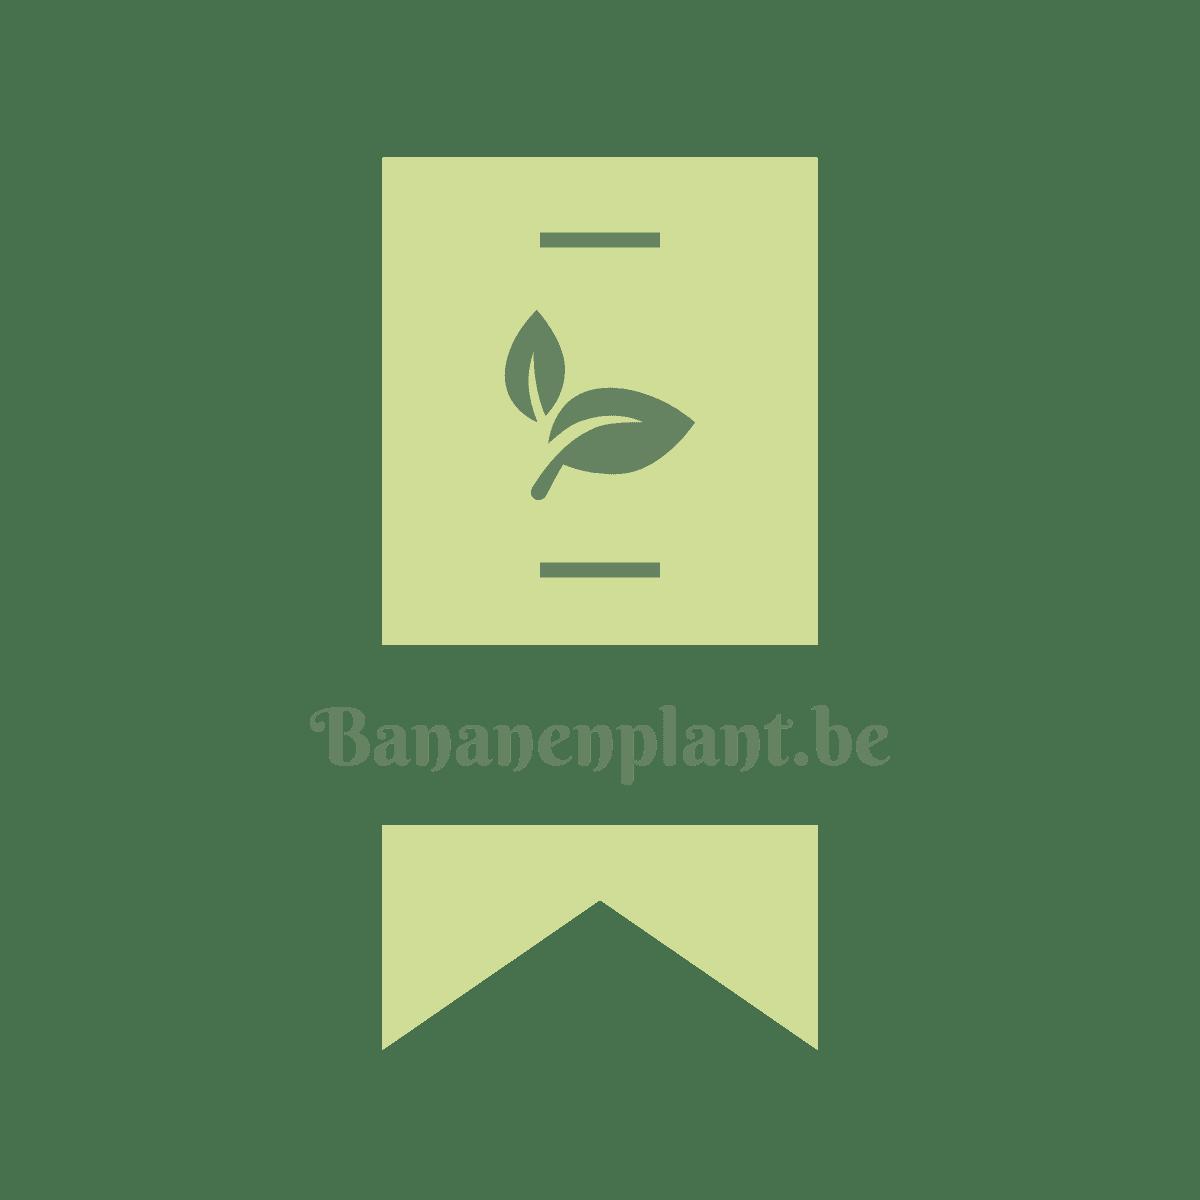 logo_bananenplant